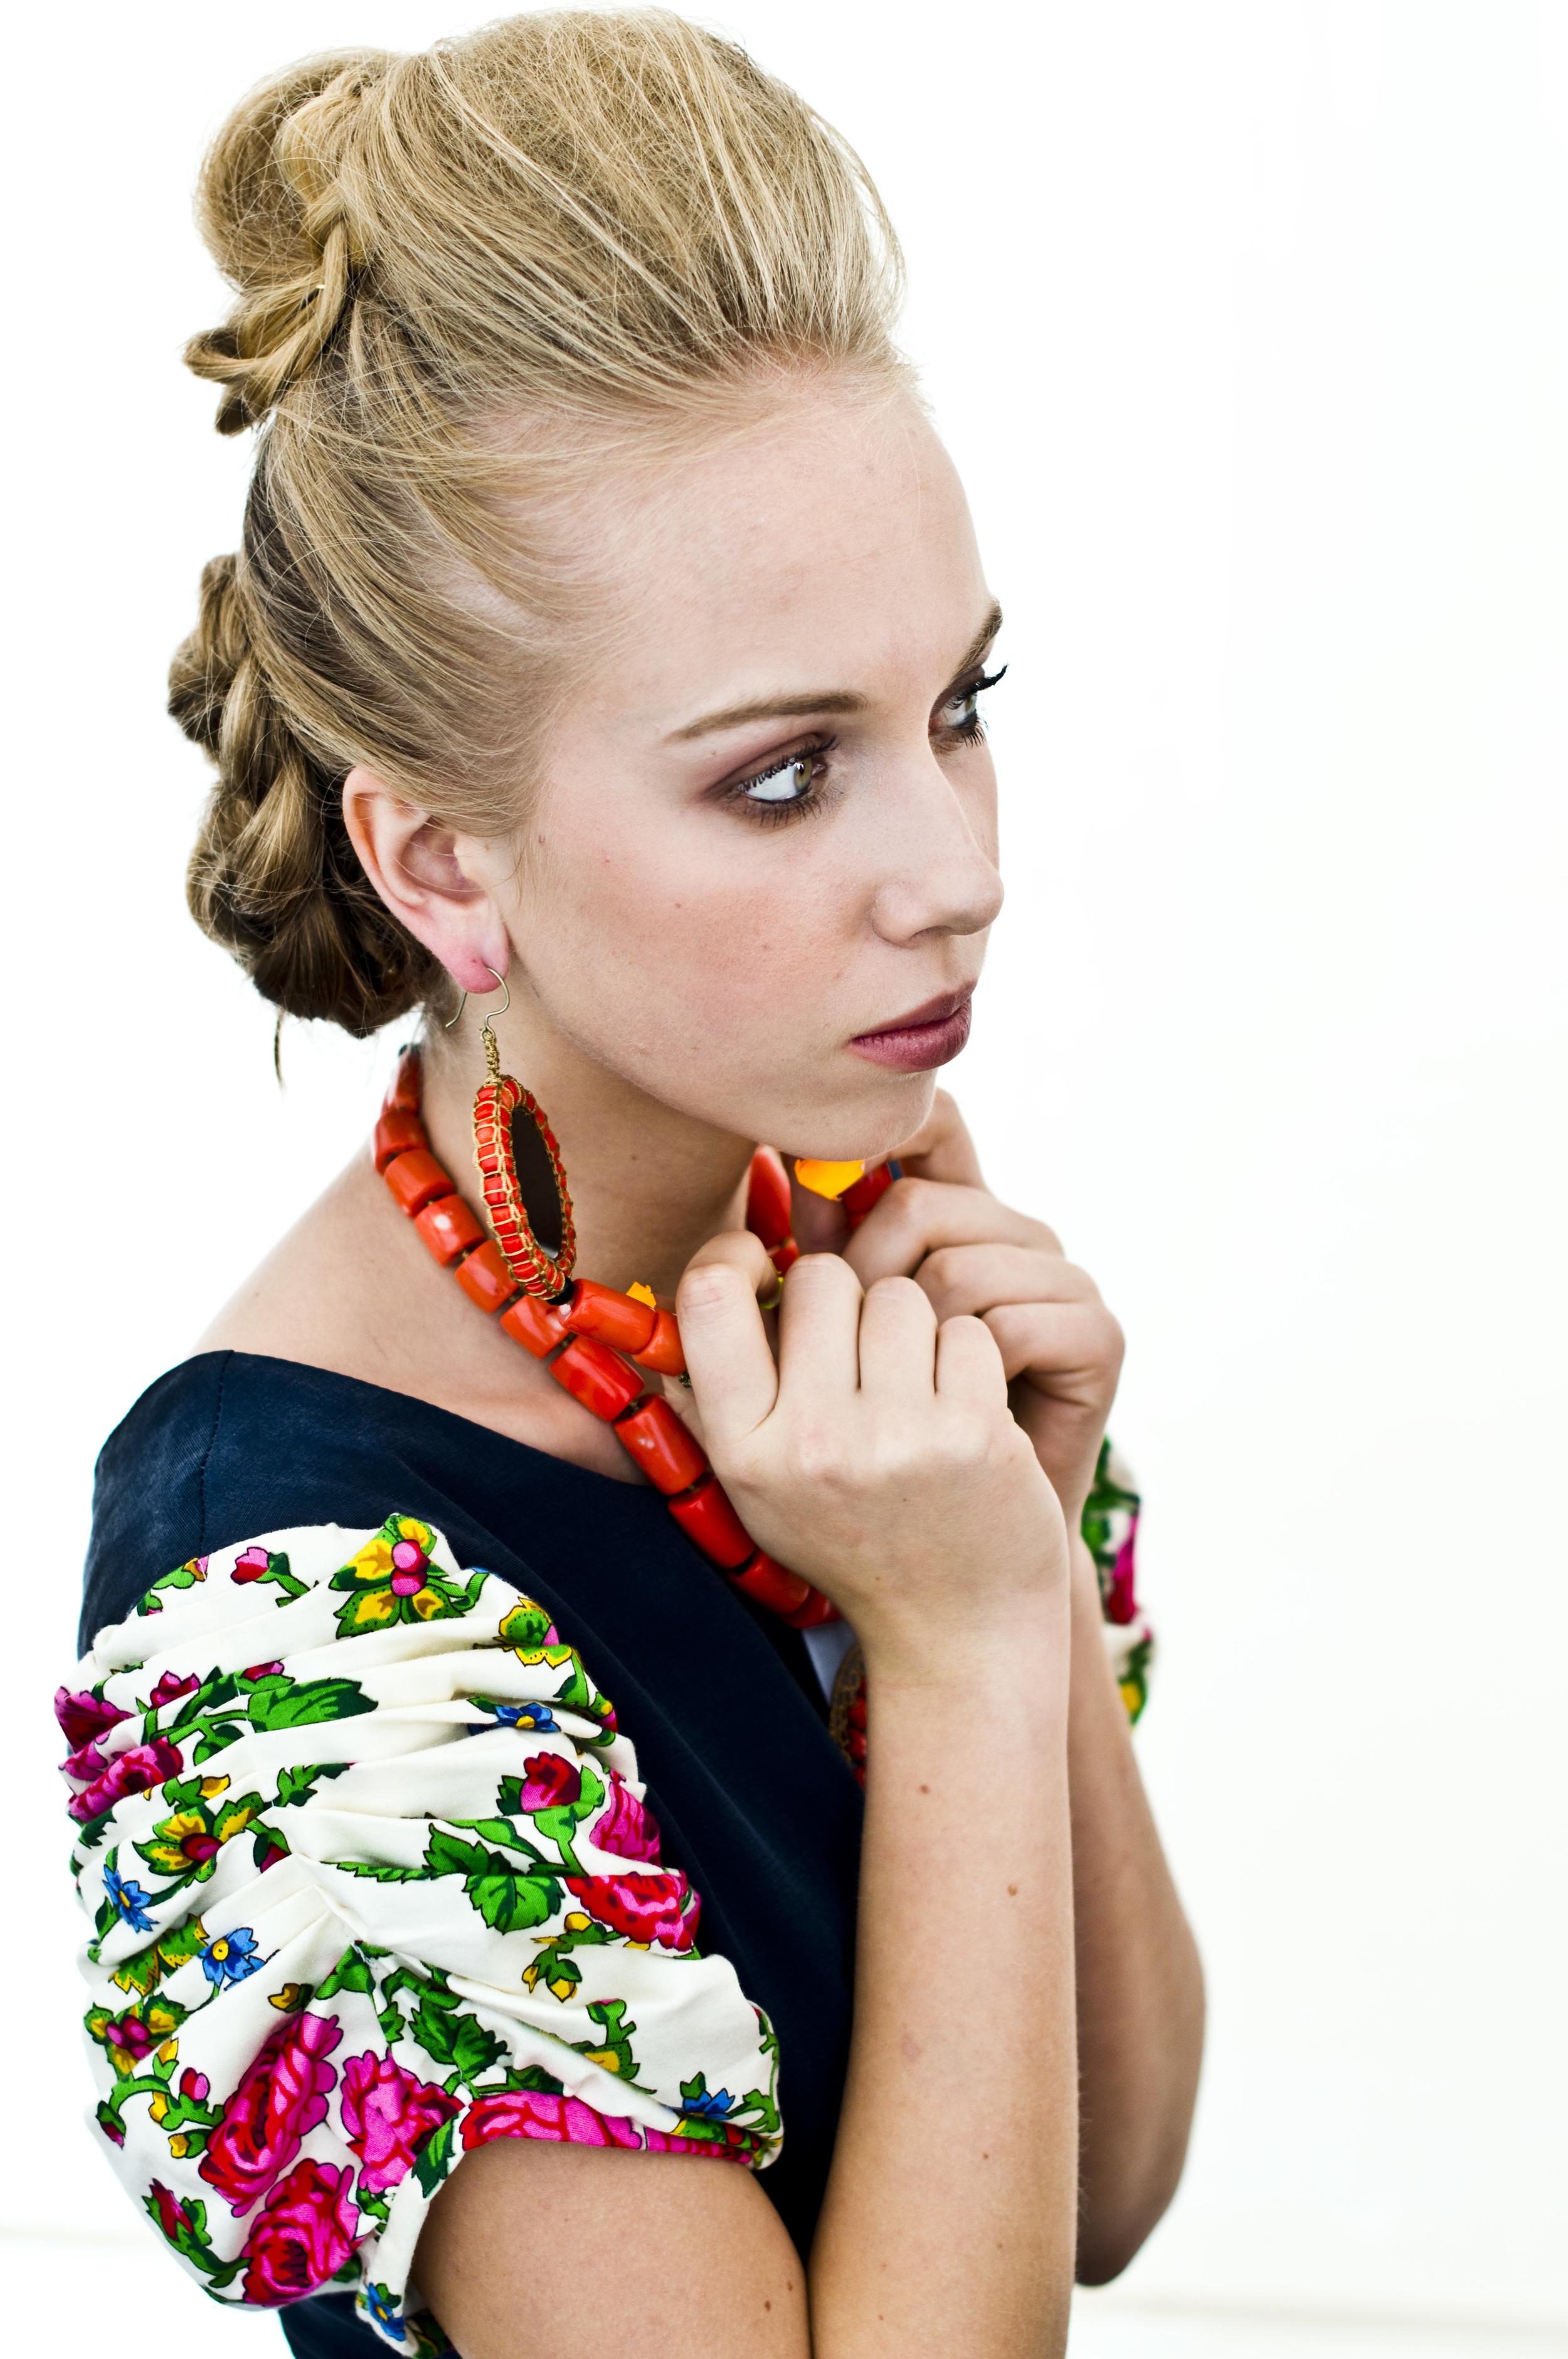 Siemienczuk_oliwia_fashion_days7_1.jpg